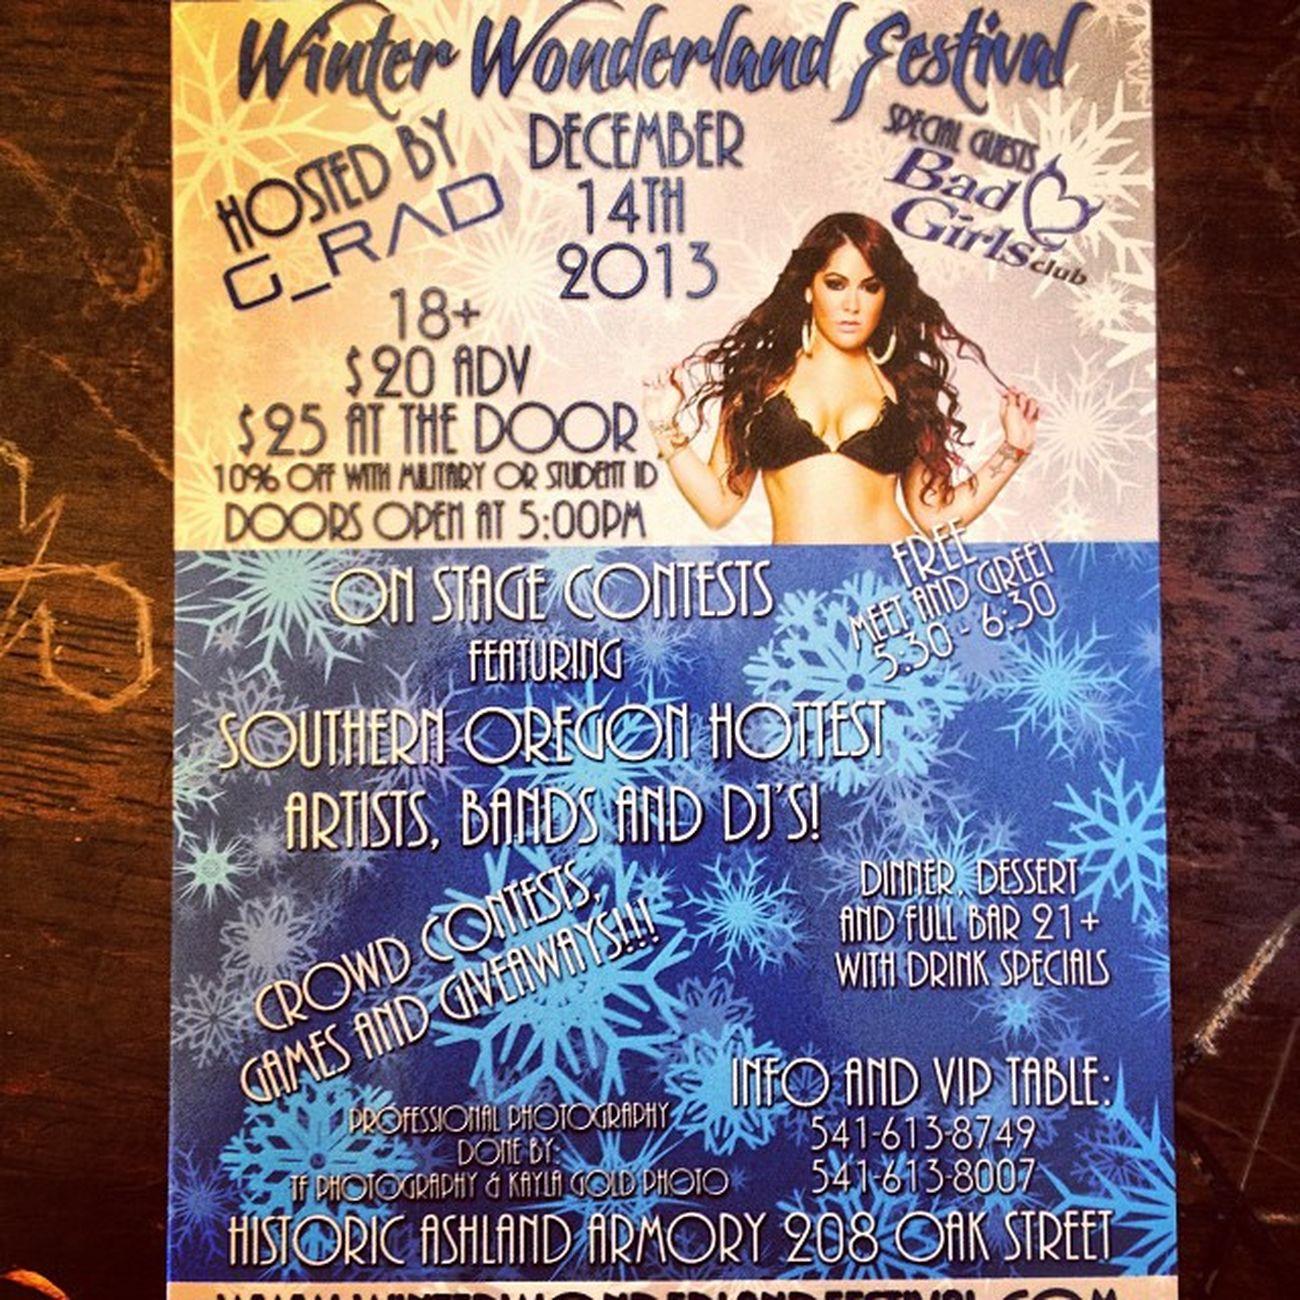 BadGirlsClub Winterwonderland Musicfestival Ashlandarmory december markyourcalenders tfphotos86 tfphotography86 photography ashland oregon 2013